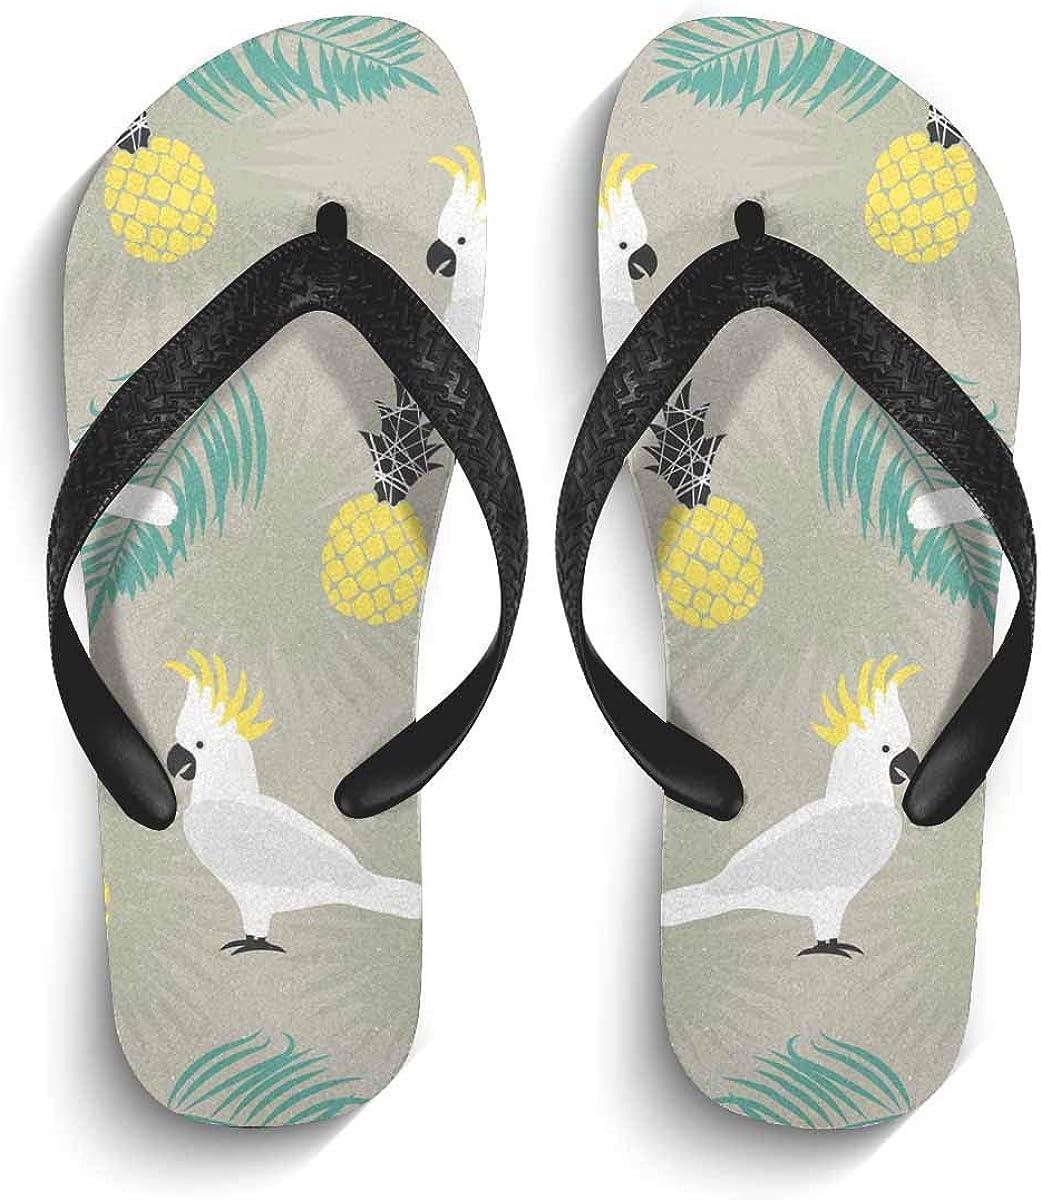 InterestPrint Non-Slip Flip Flops Sandal Cute Parrots Palm Leaves and Pineapples Lightweight Summer Beach Thong Slippers for Men S